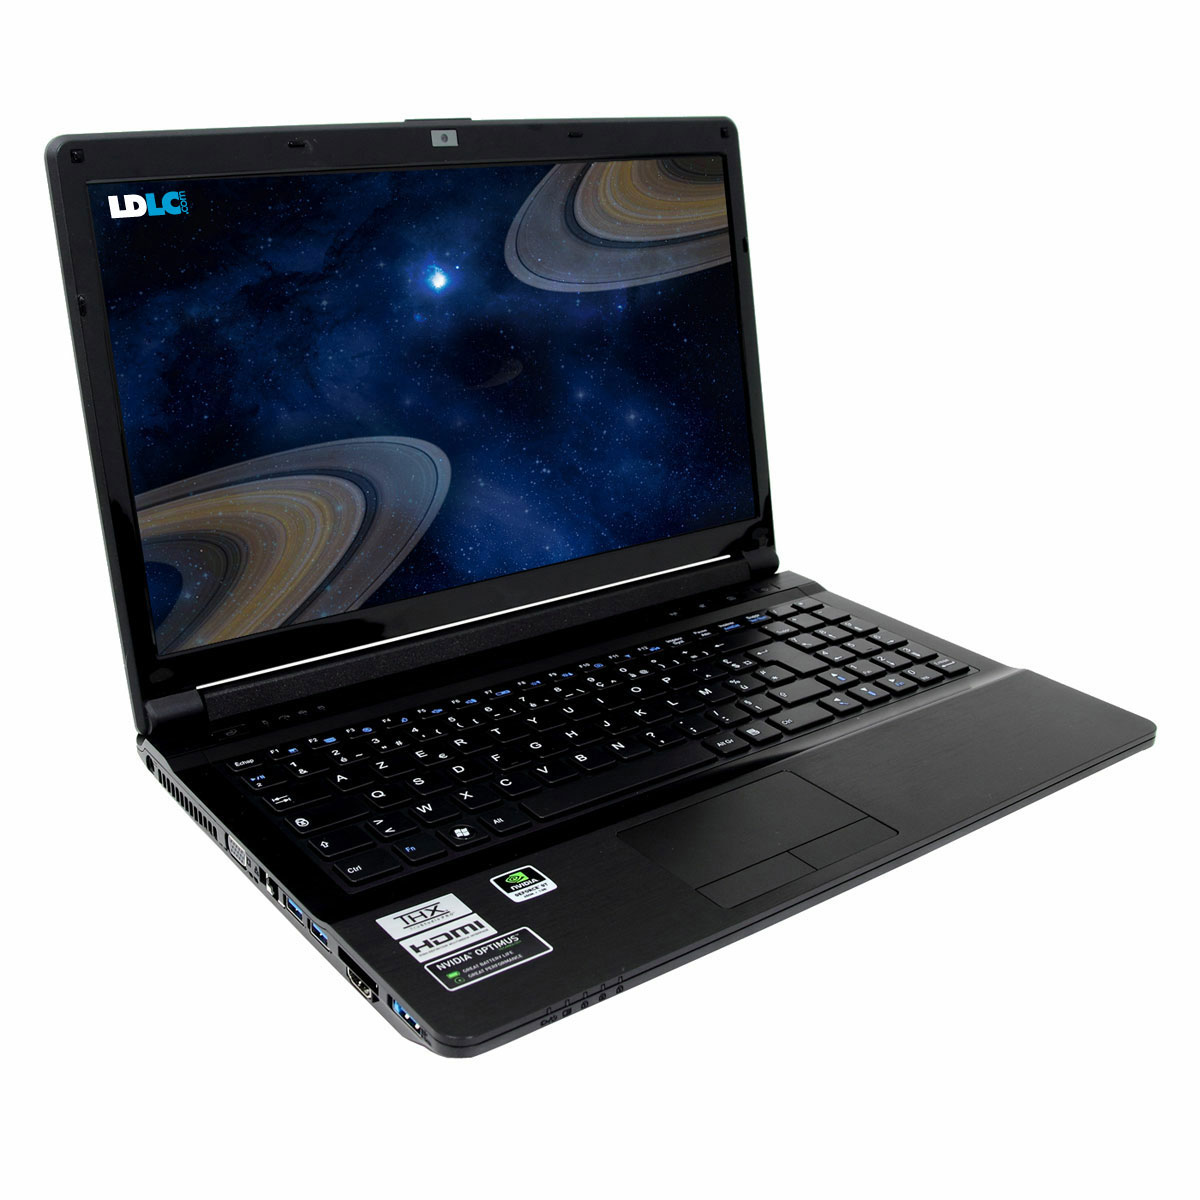 "PC portable LDLC Saturne SB5-I3-8-H10-H Intel Core i3-3110M 8 Go 1 To 15.6"" LED NVIDIA GeForce GT 650M Lecteur Blu-ray/Graveur DVD Wi-Fi N/Bluetooth Webcam Windows 7 Premium 64 bits"